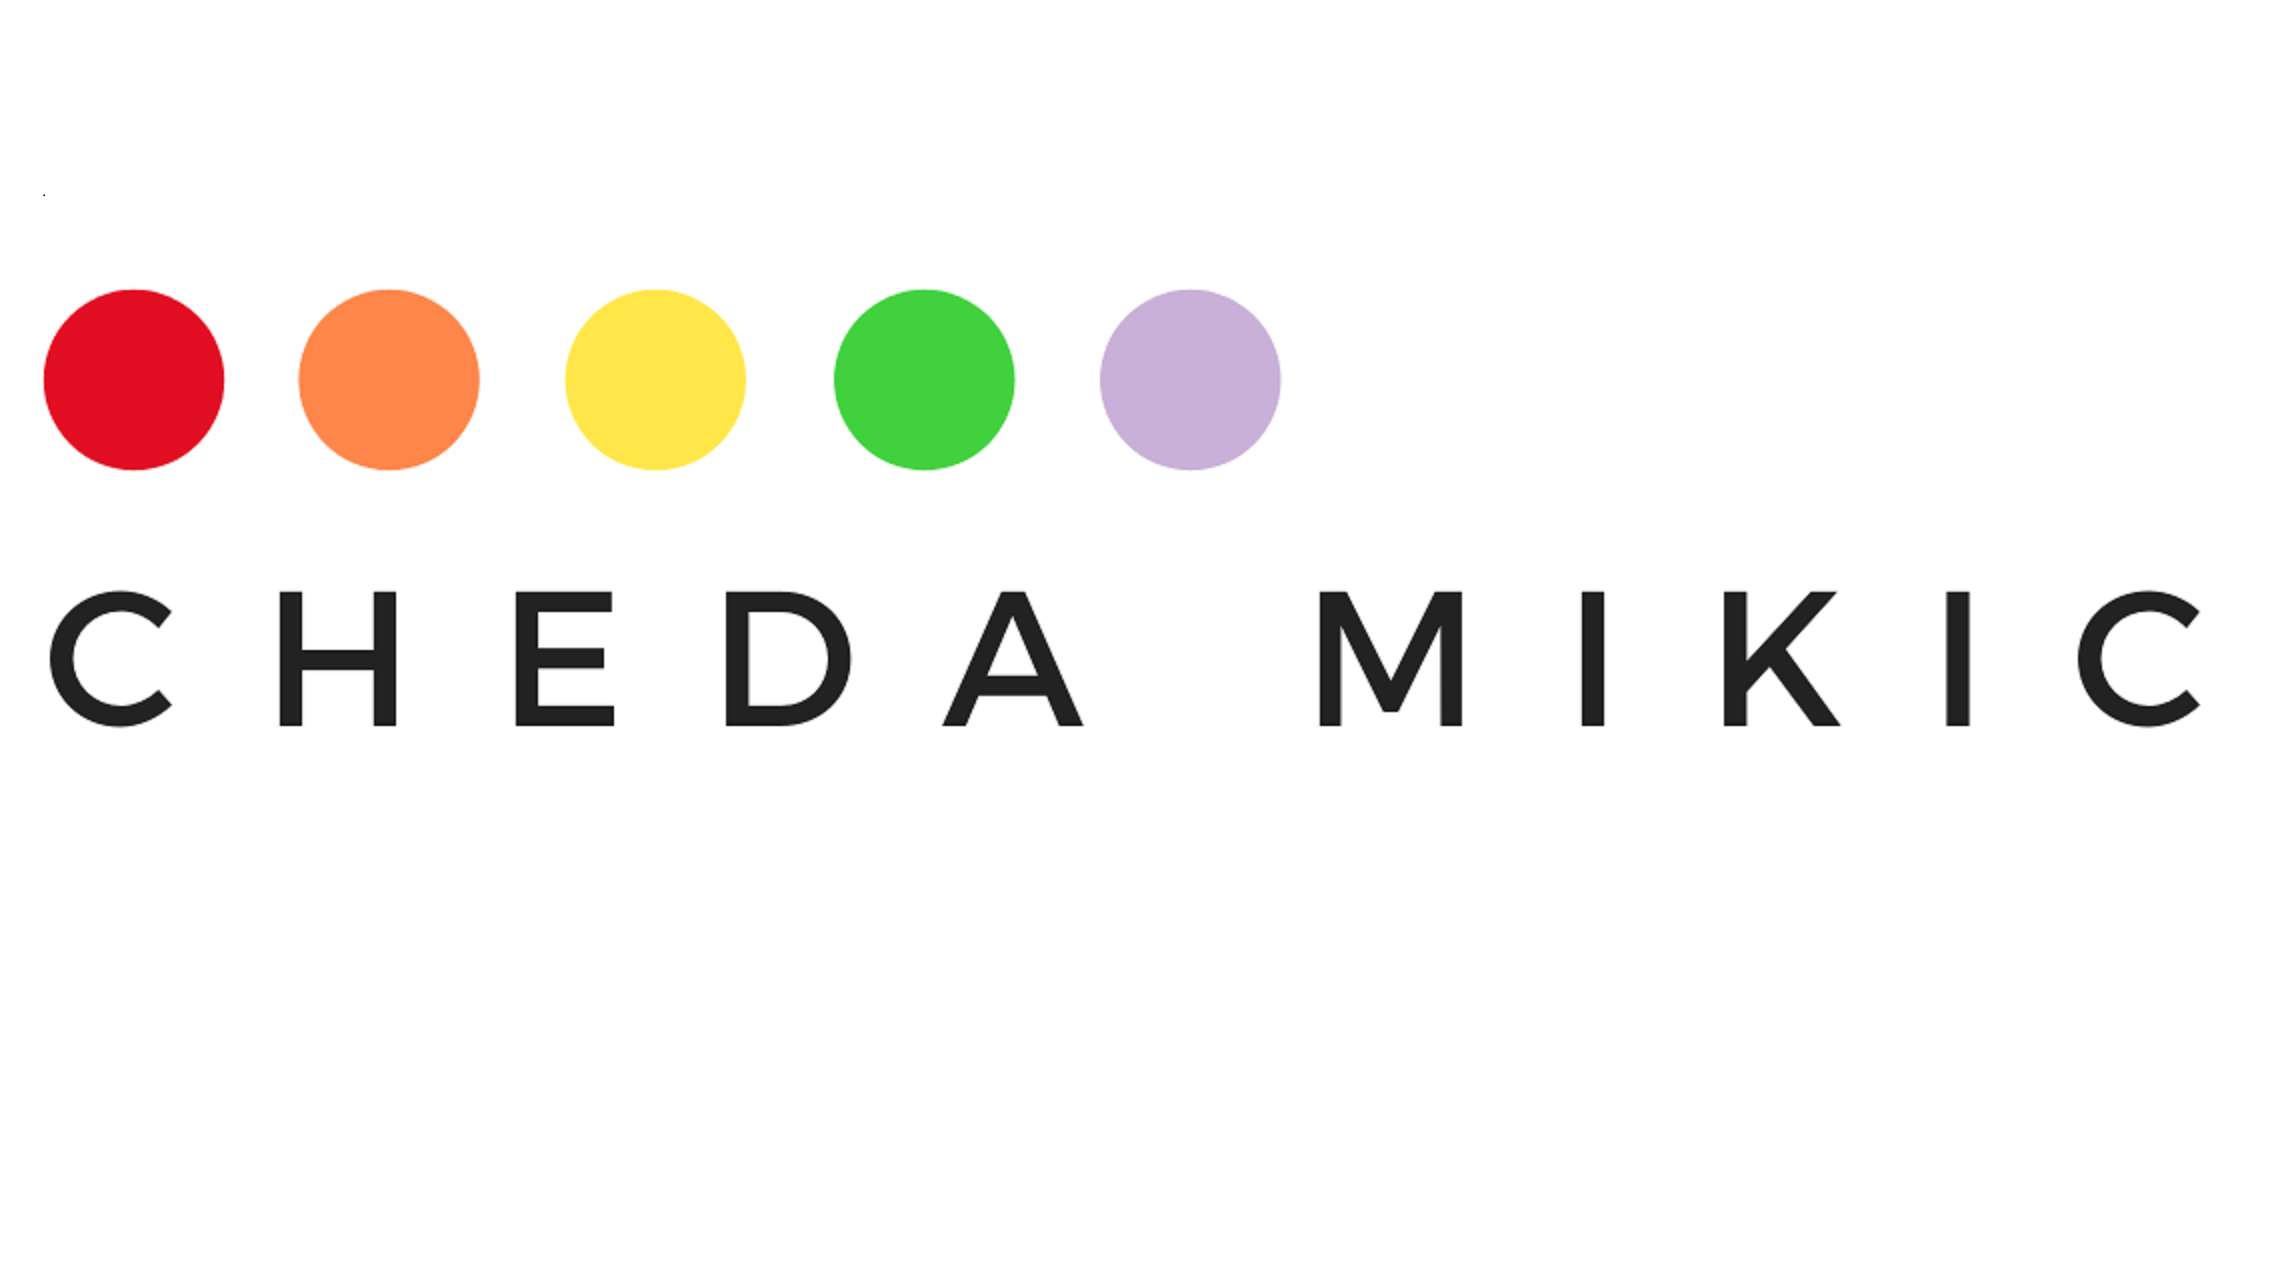 Cheda Mikic